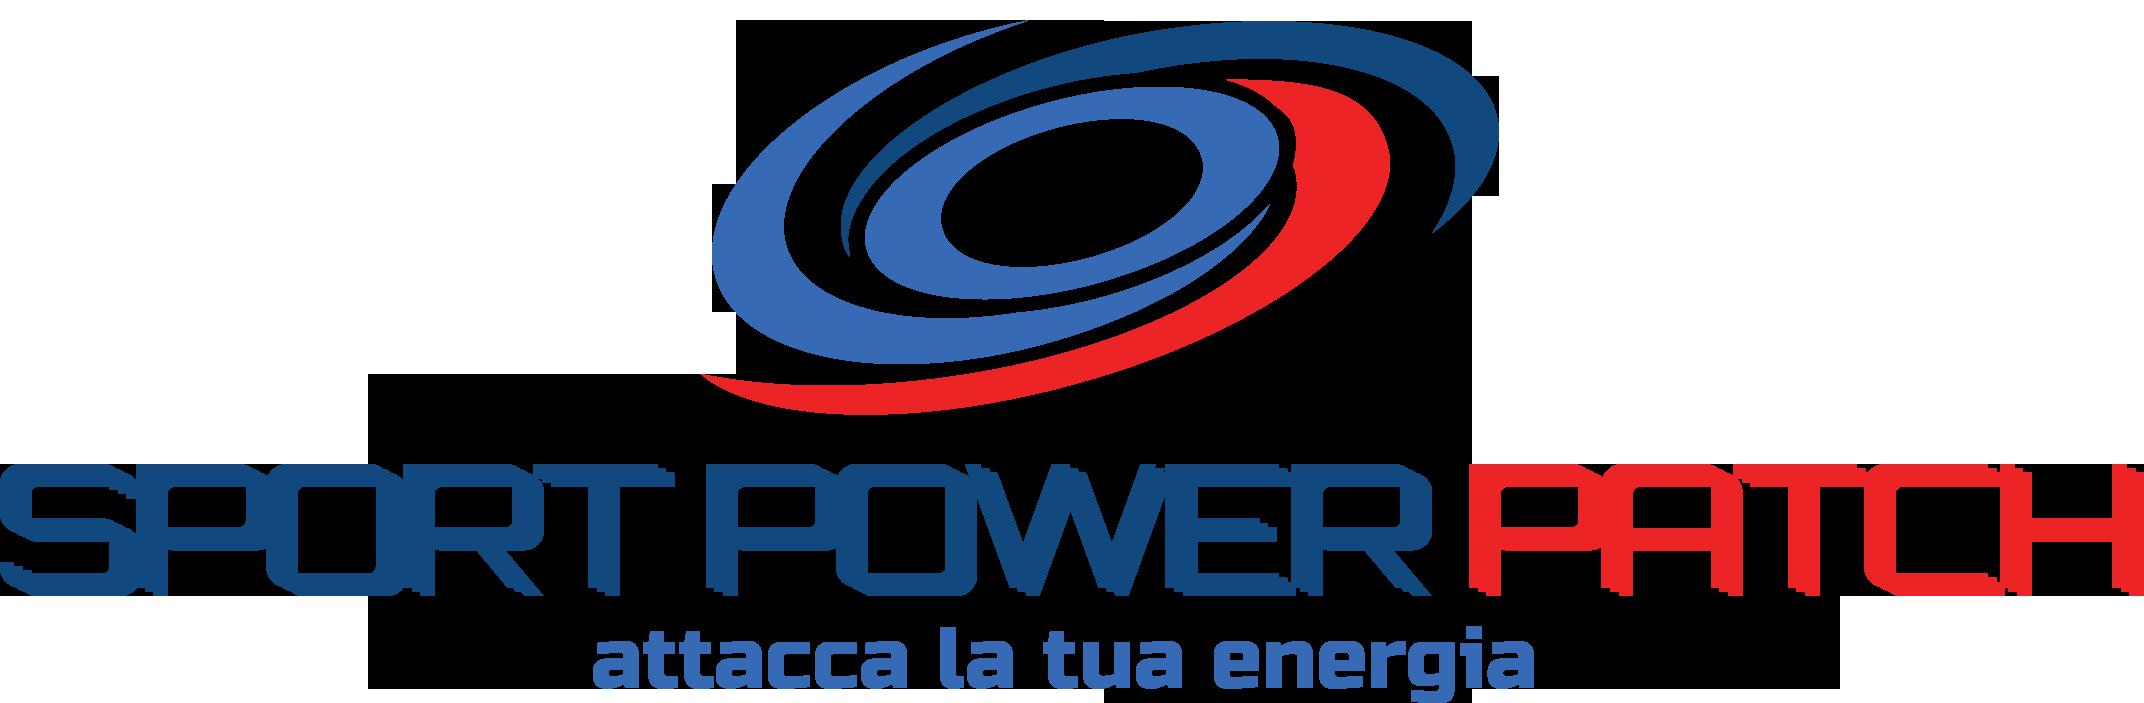 SportPowerPatch attacca la tua energia